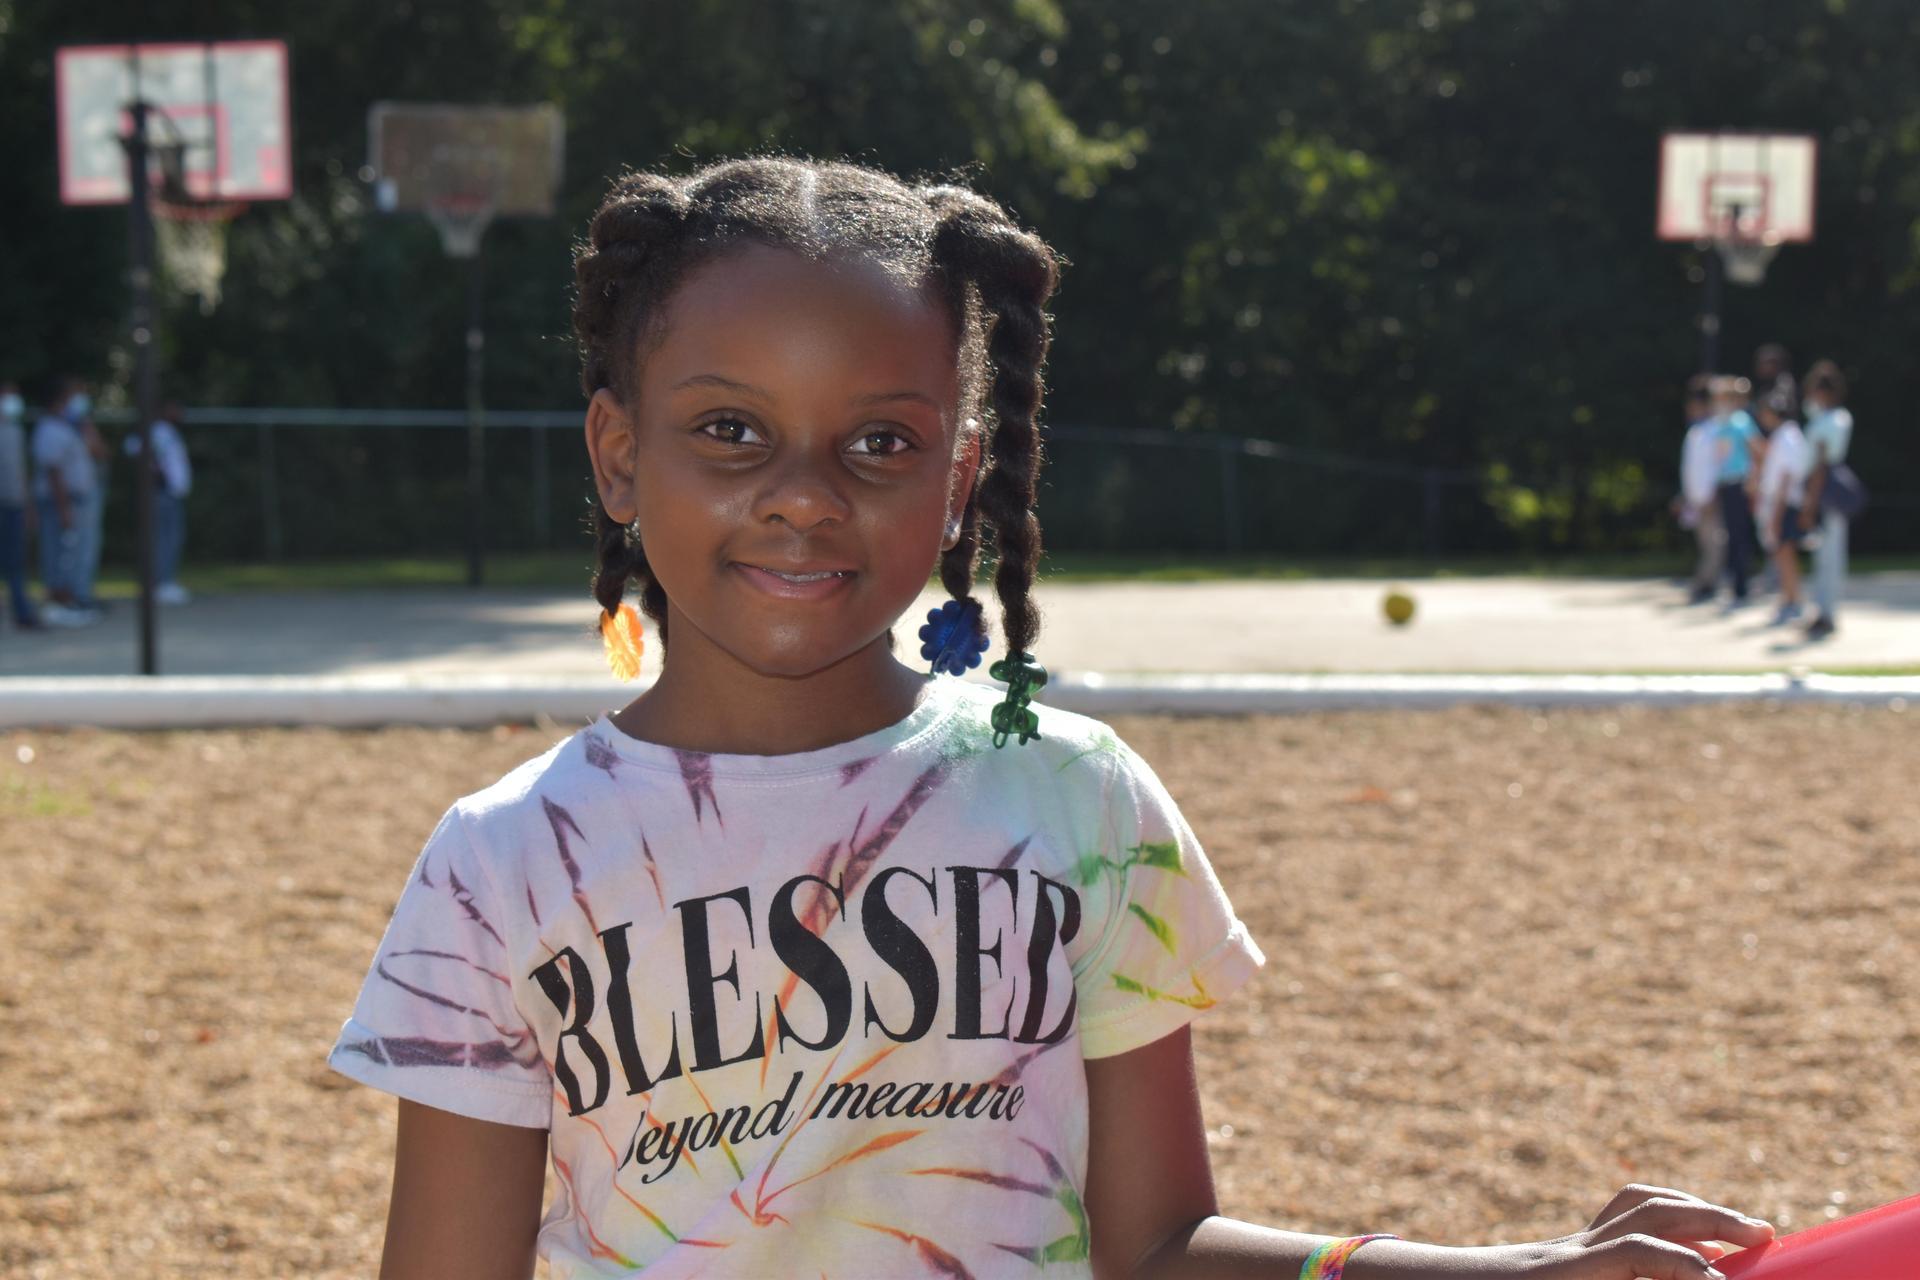 Susie B. West Elementary School